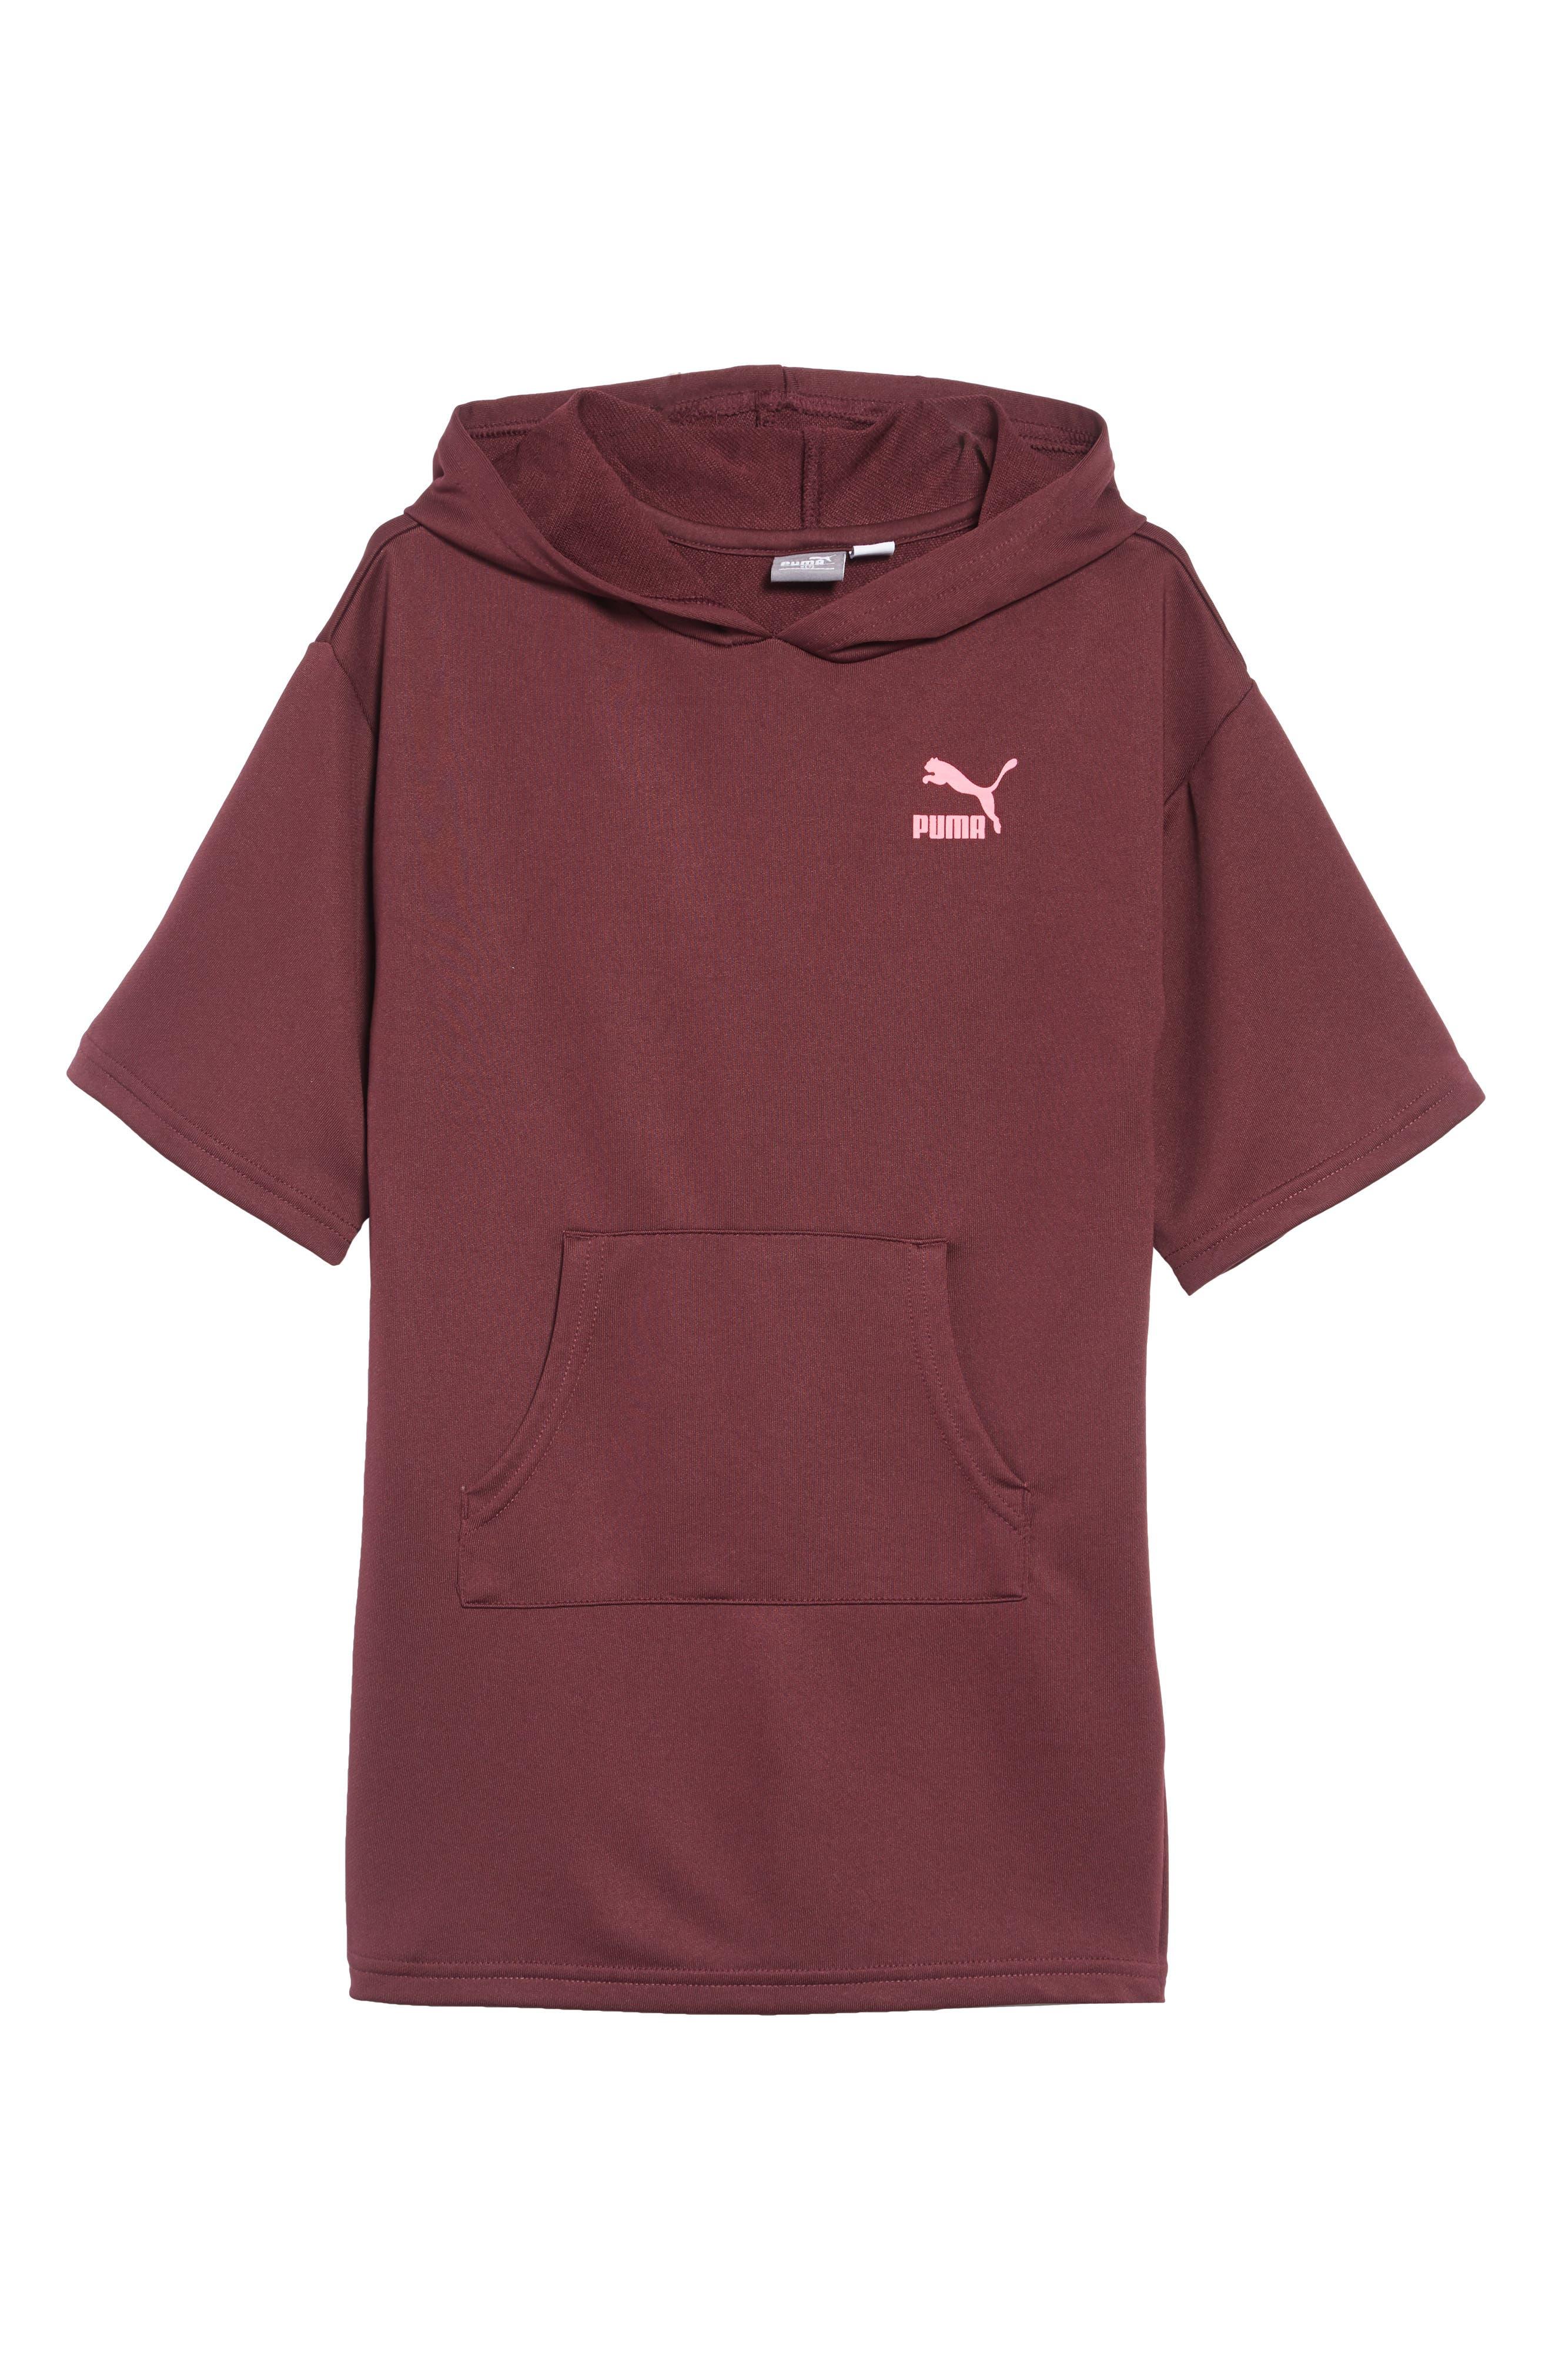 PUMA,                             Oversized Hooded Sweatshirt Dress,                             Main thumbnail 1, color,                             597